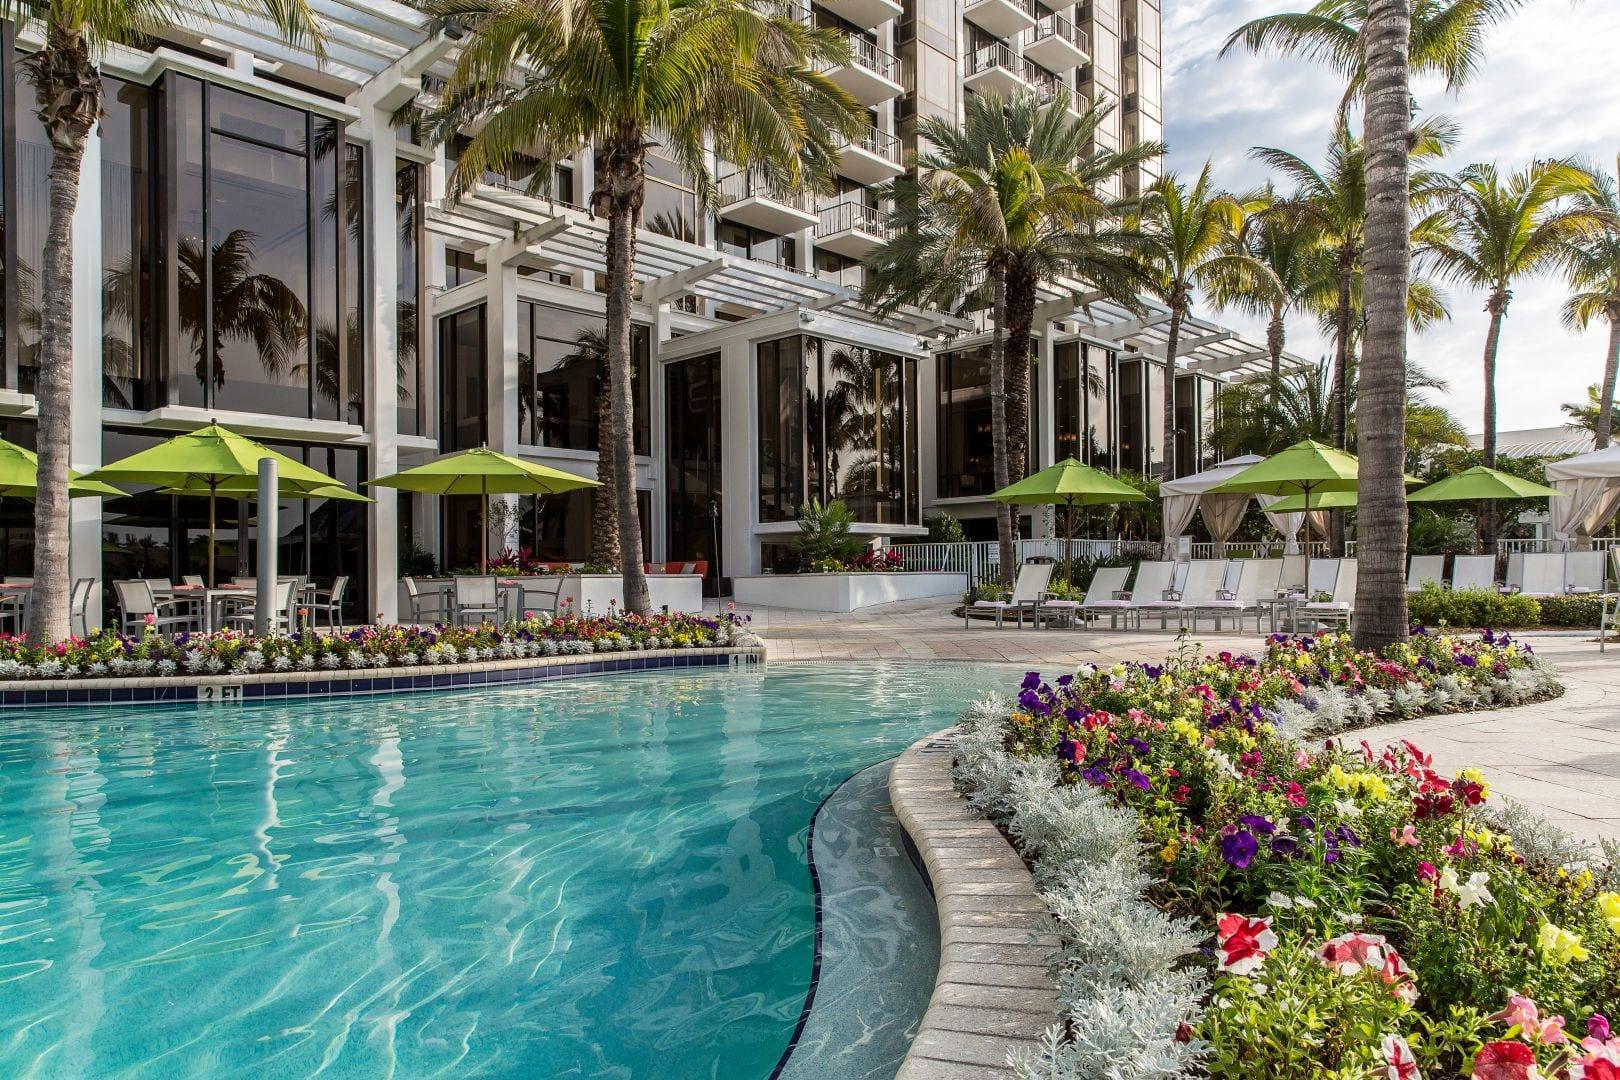 Sarasota Bay Waterfront Hotel And Marina | Hyatt Regency Sarasota - Map Of Hotels In Sarasota Florida